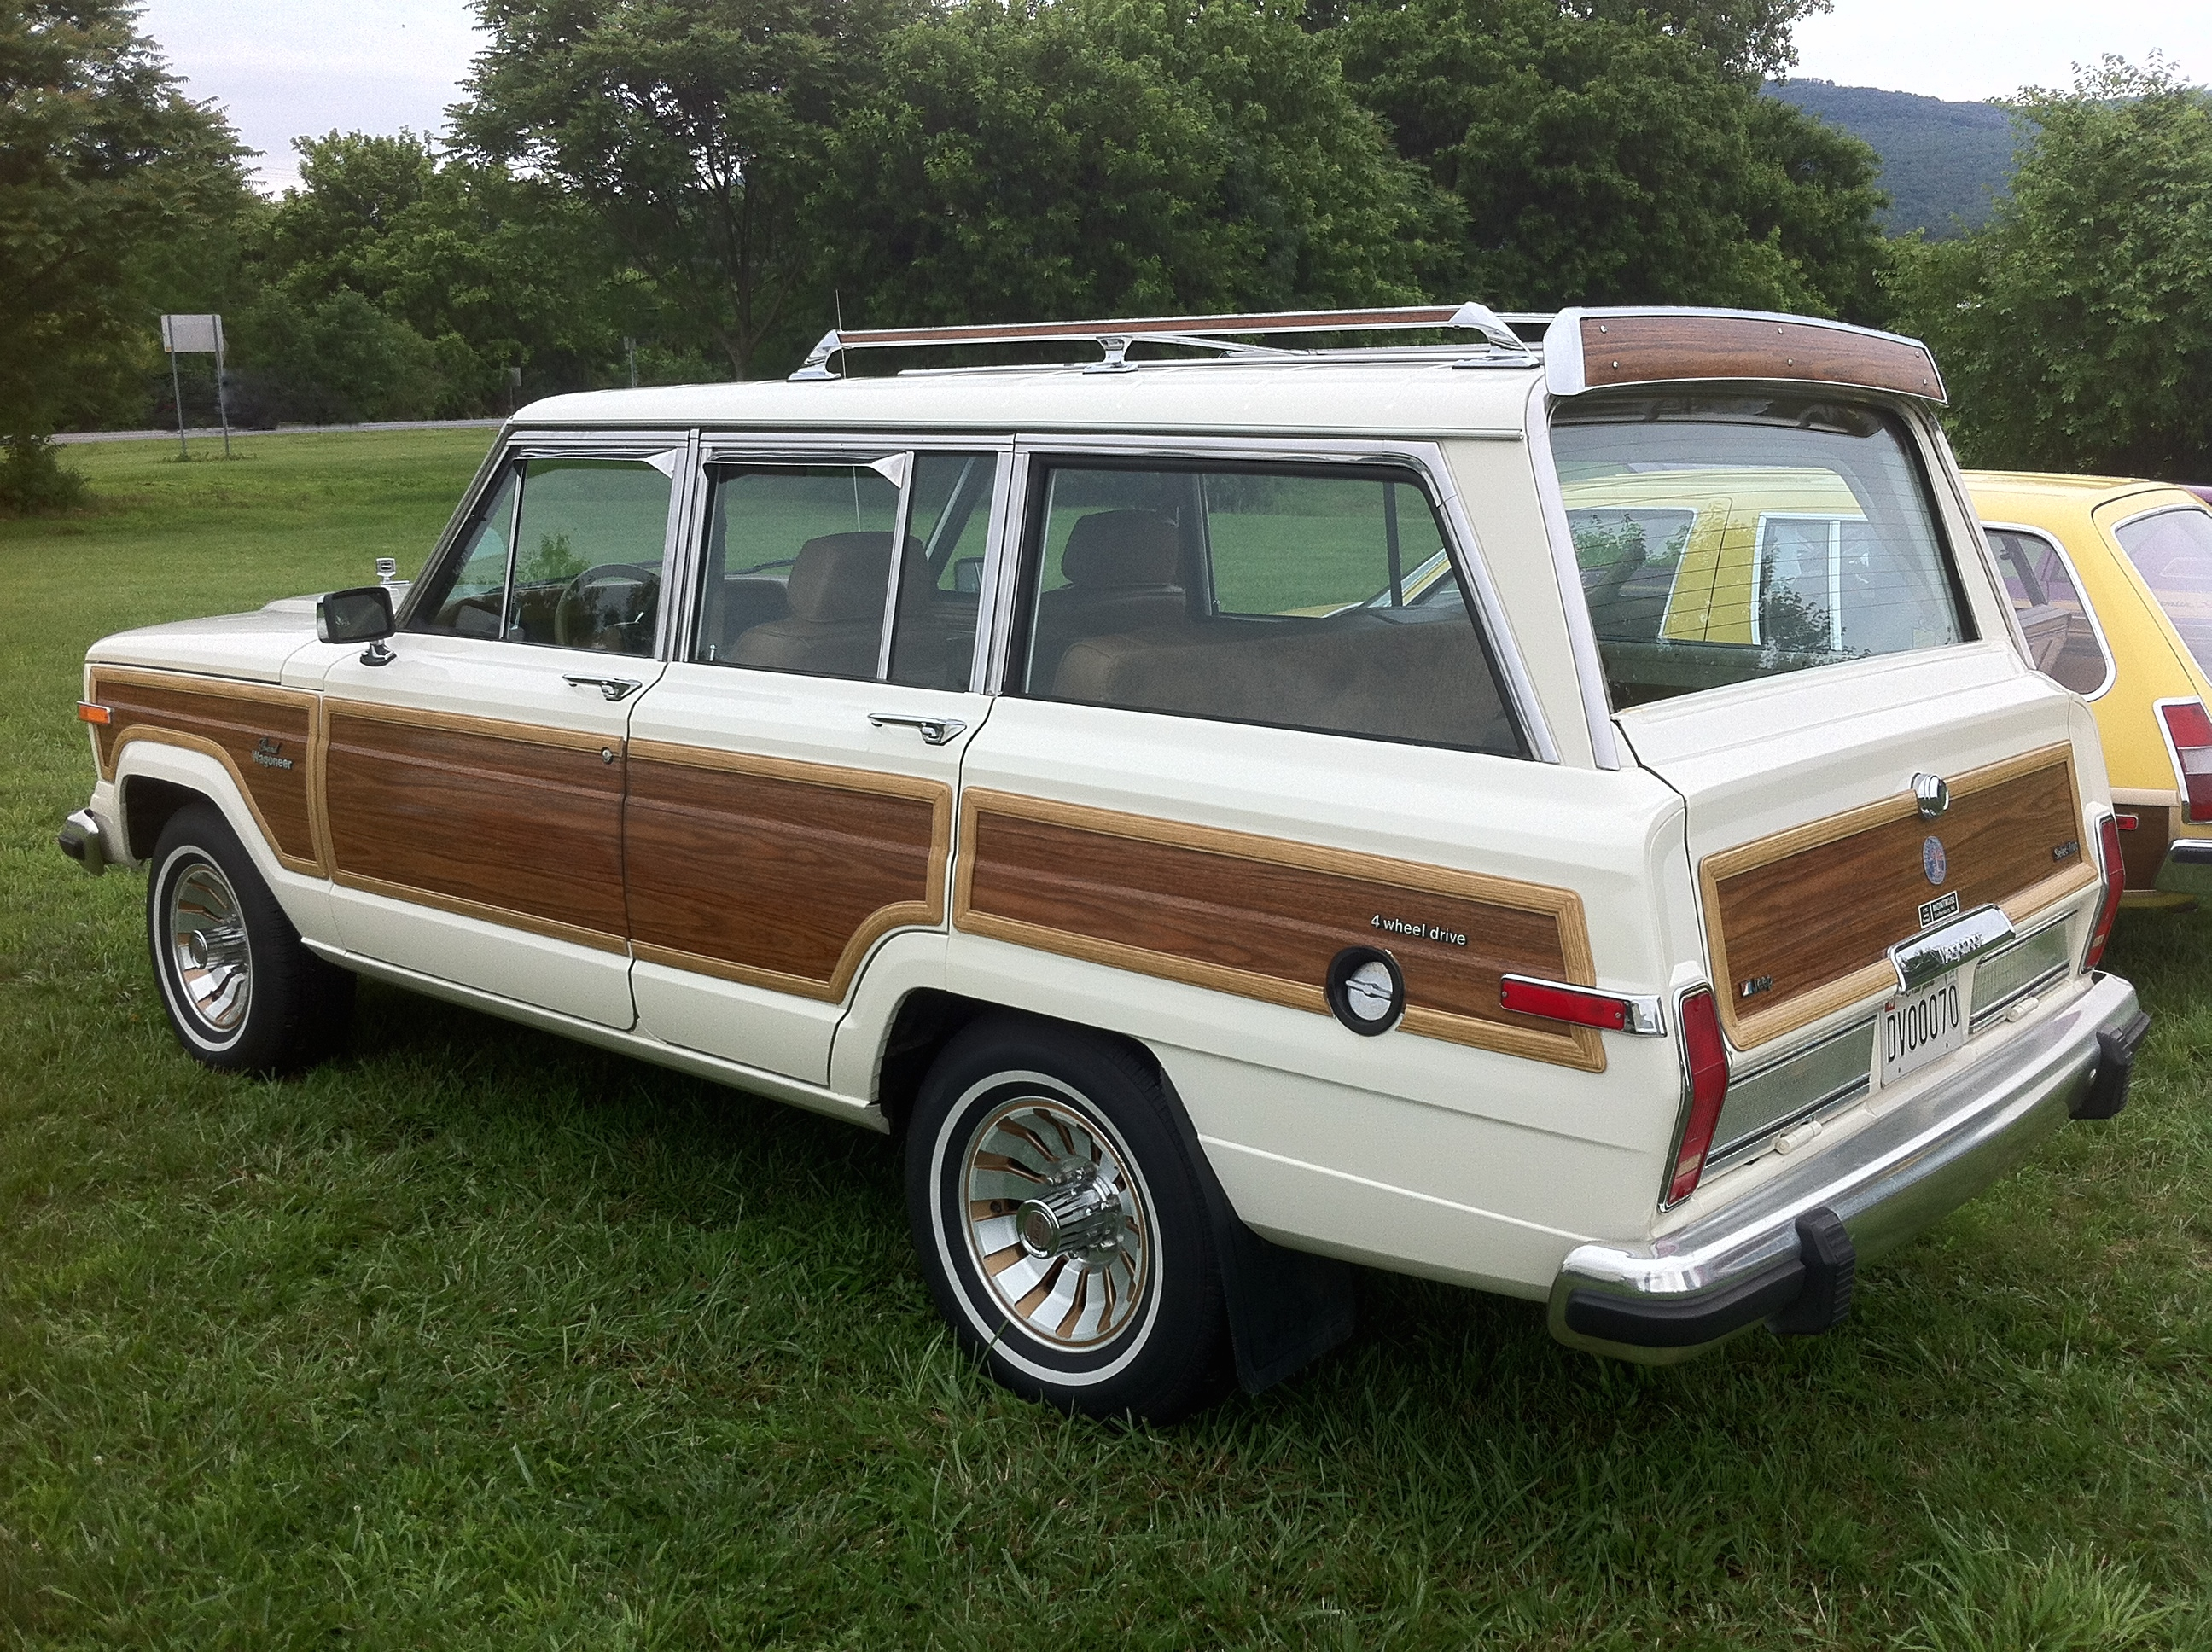 File:1986 Jeep Grand Wagoneer White F Mason Dixon Dragway 2014